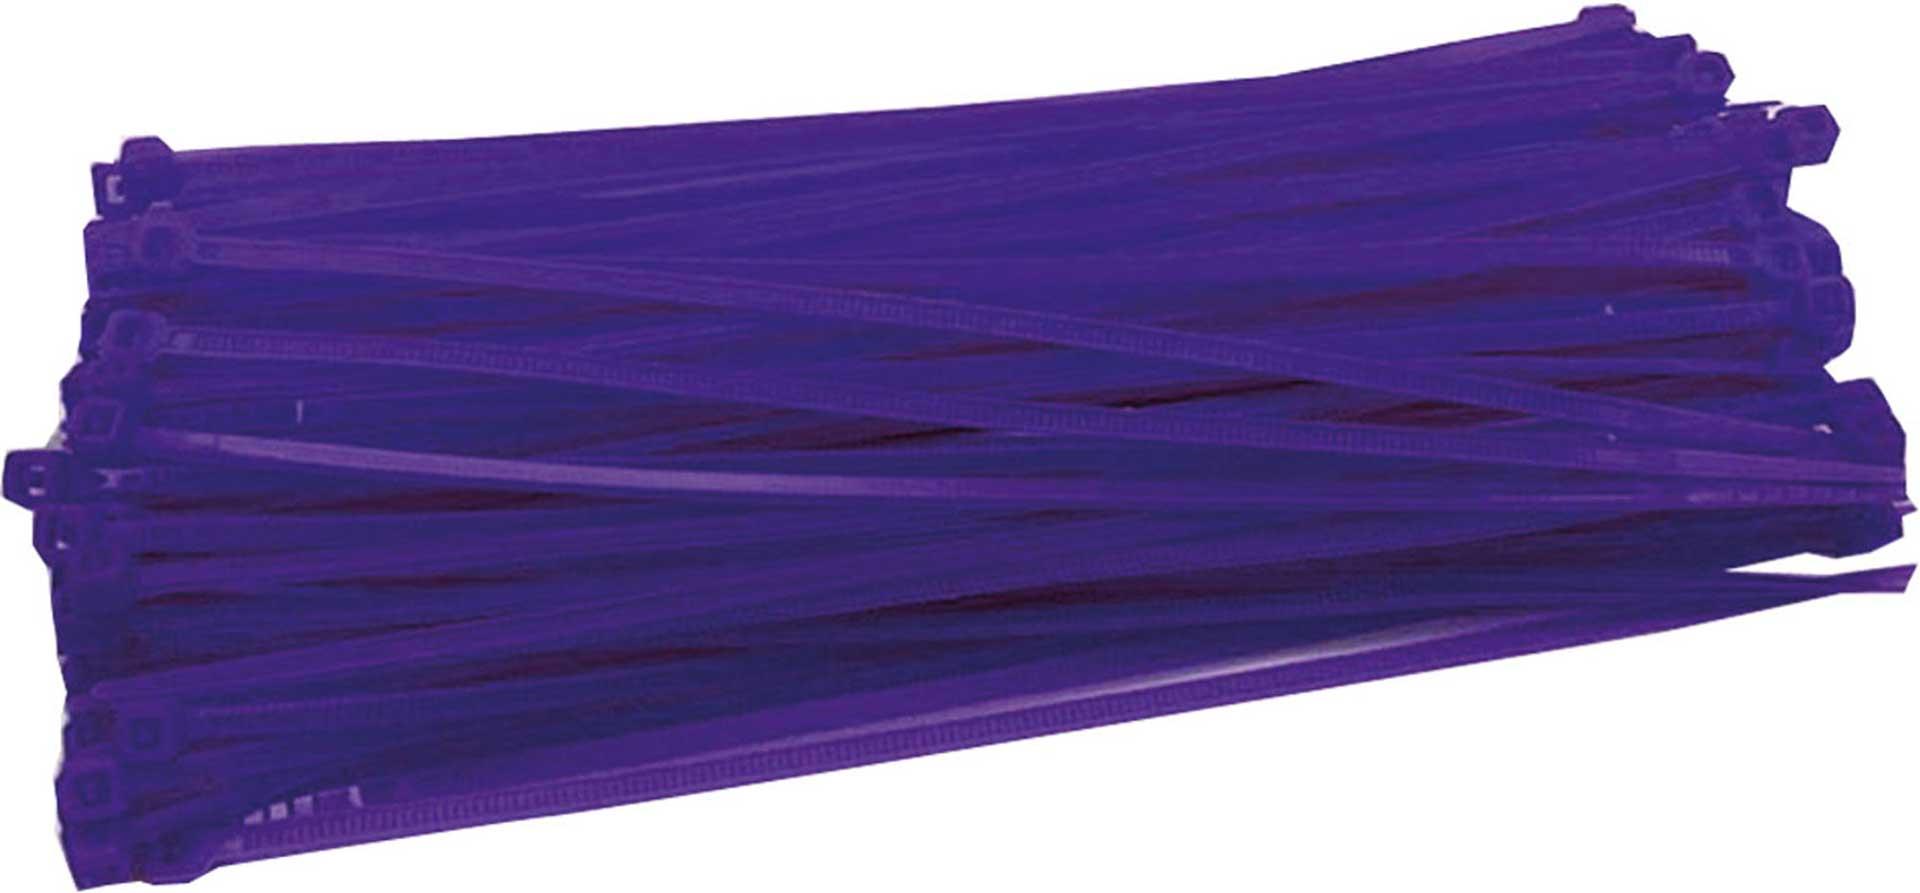 ROBBE KABELBINDER 3X150 MM 100 Stück Blau